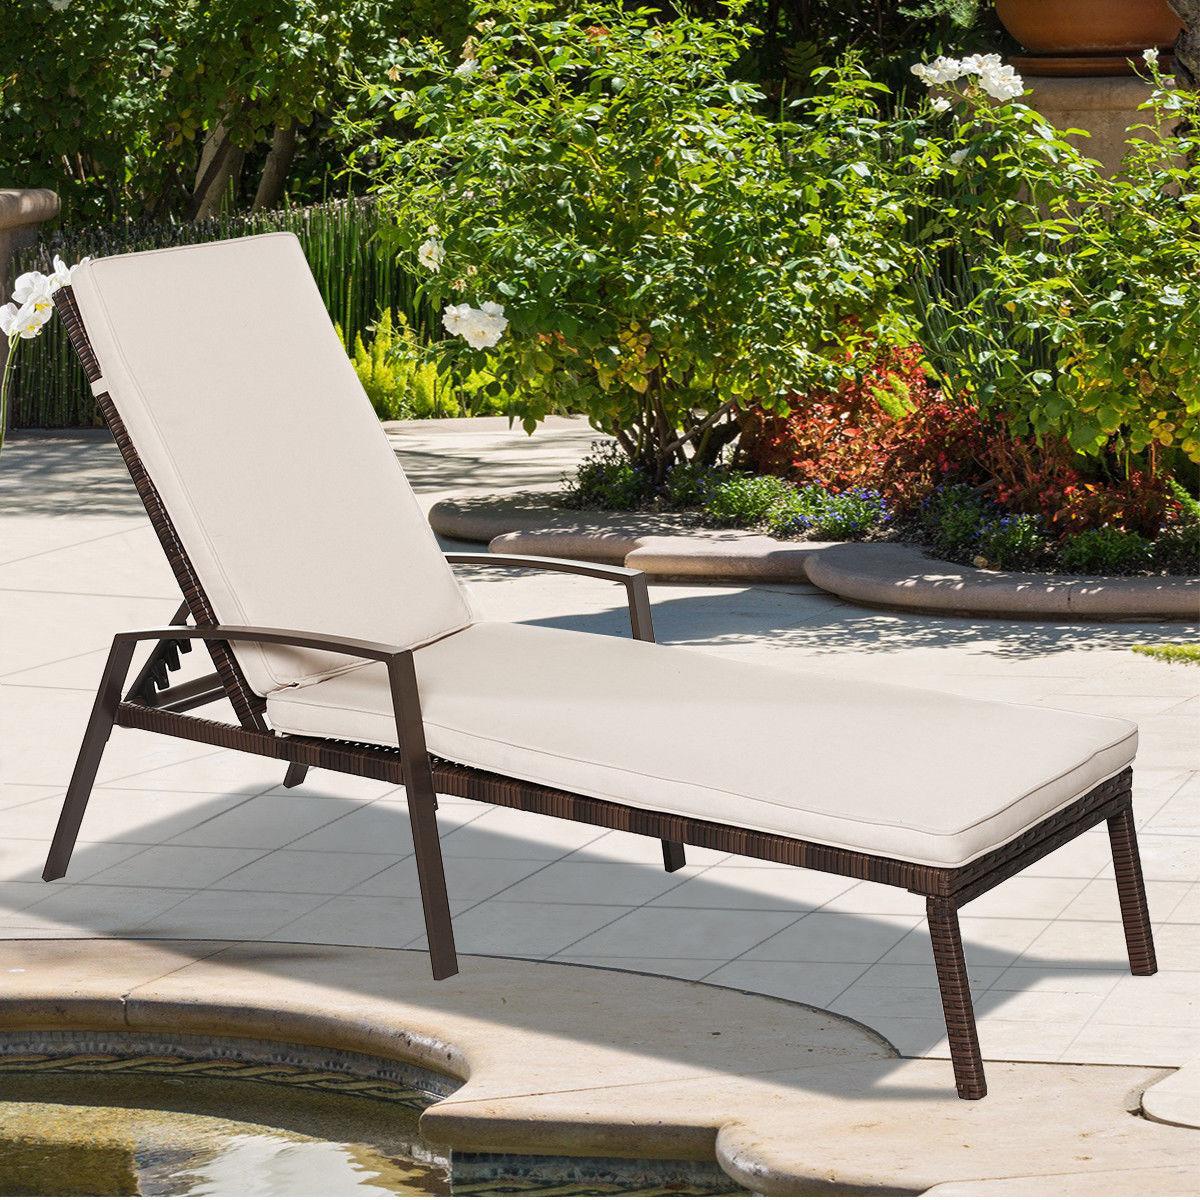 2pcs Patio Rattan Lounge Chair Garden Furniture Adjustable Back W/ Cushion - image 6 of 10